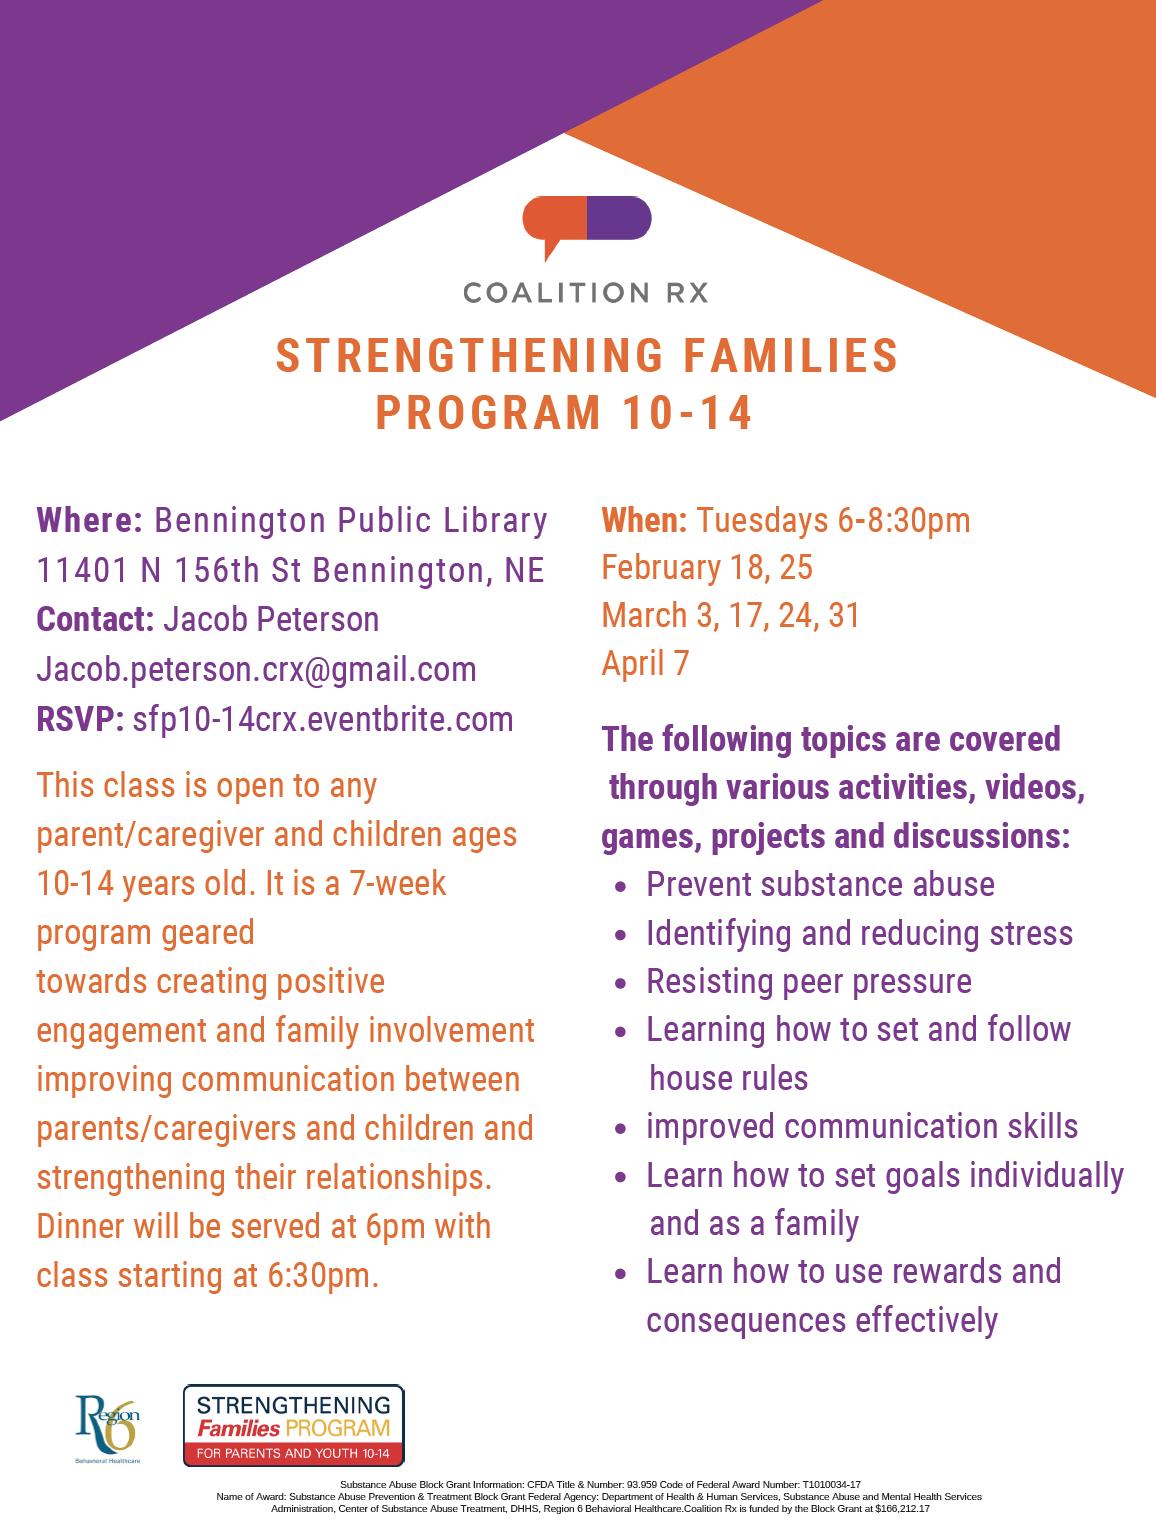 Strengthening Families Program 10-14 hosted by Bennington